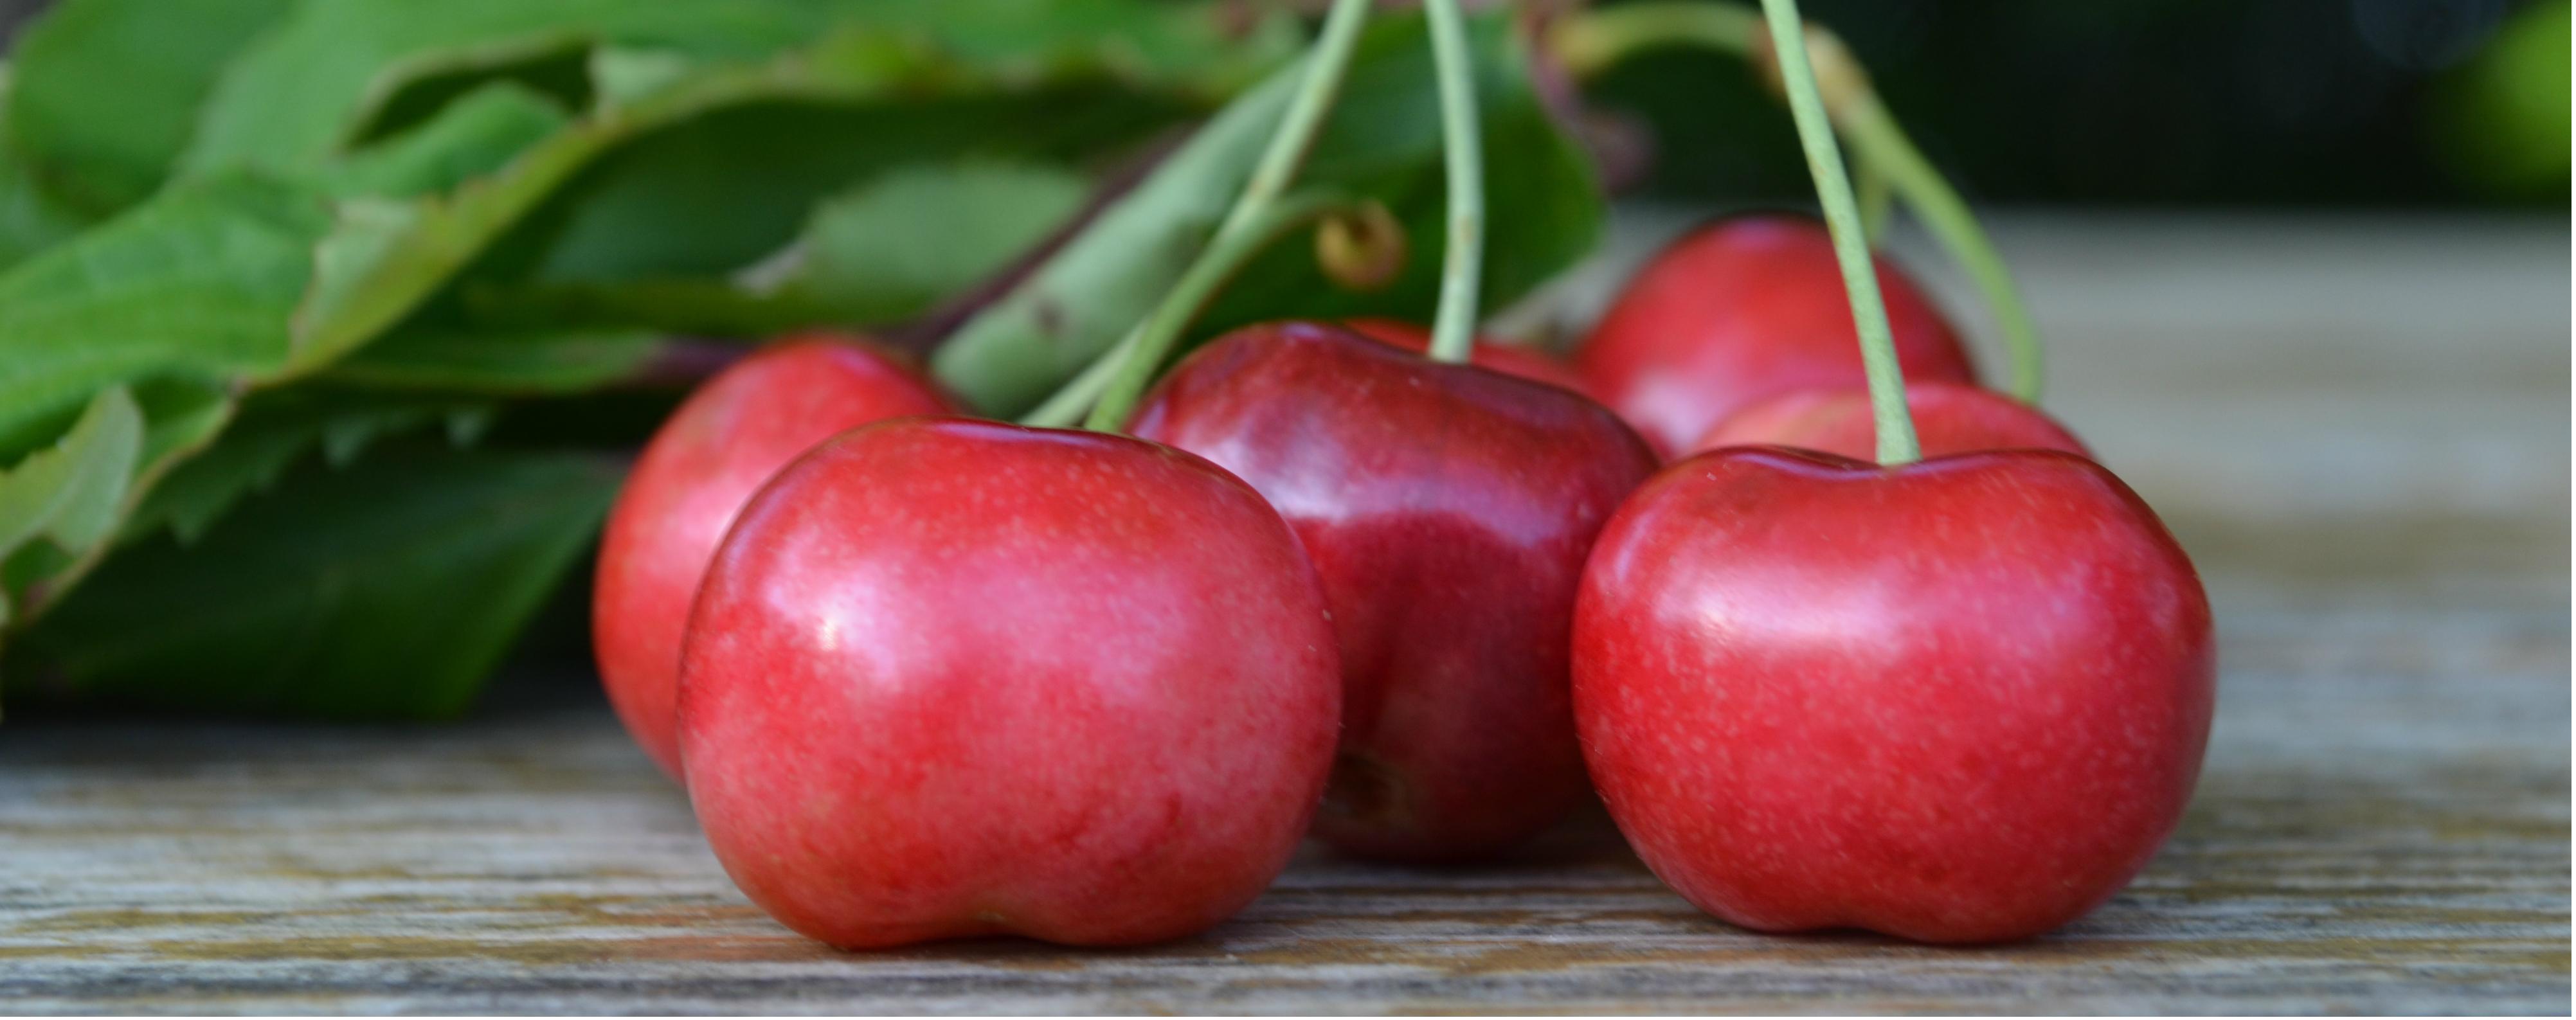 Heirloom Itxassou Cherry Varieties